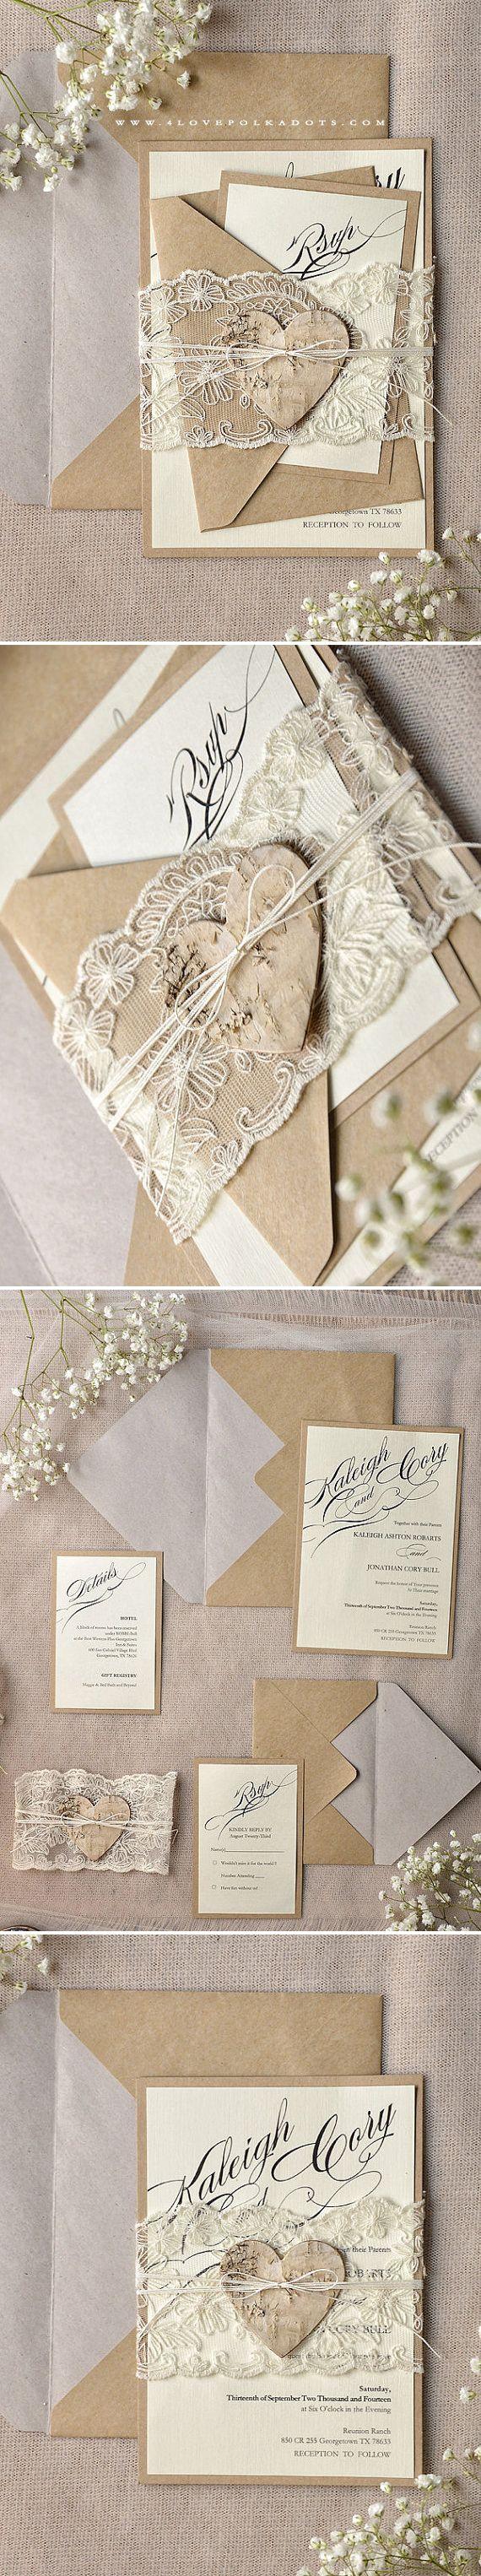 Rustic Romantic Wedding Invitations with real lace & birch bark heart tag #romantic #rustic #weddinginspirations #countrywedding